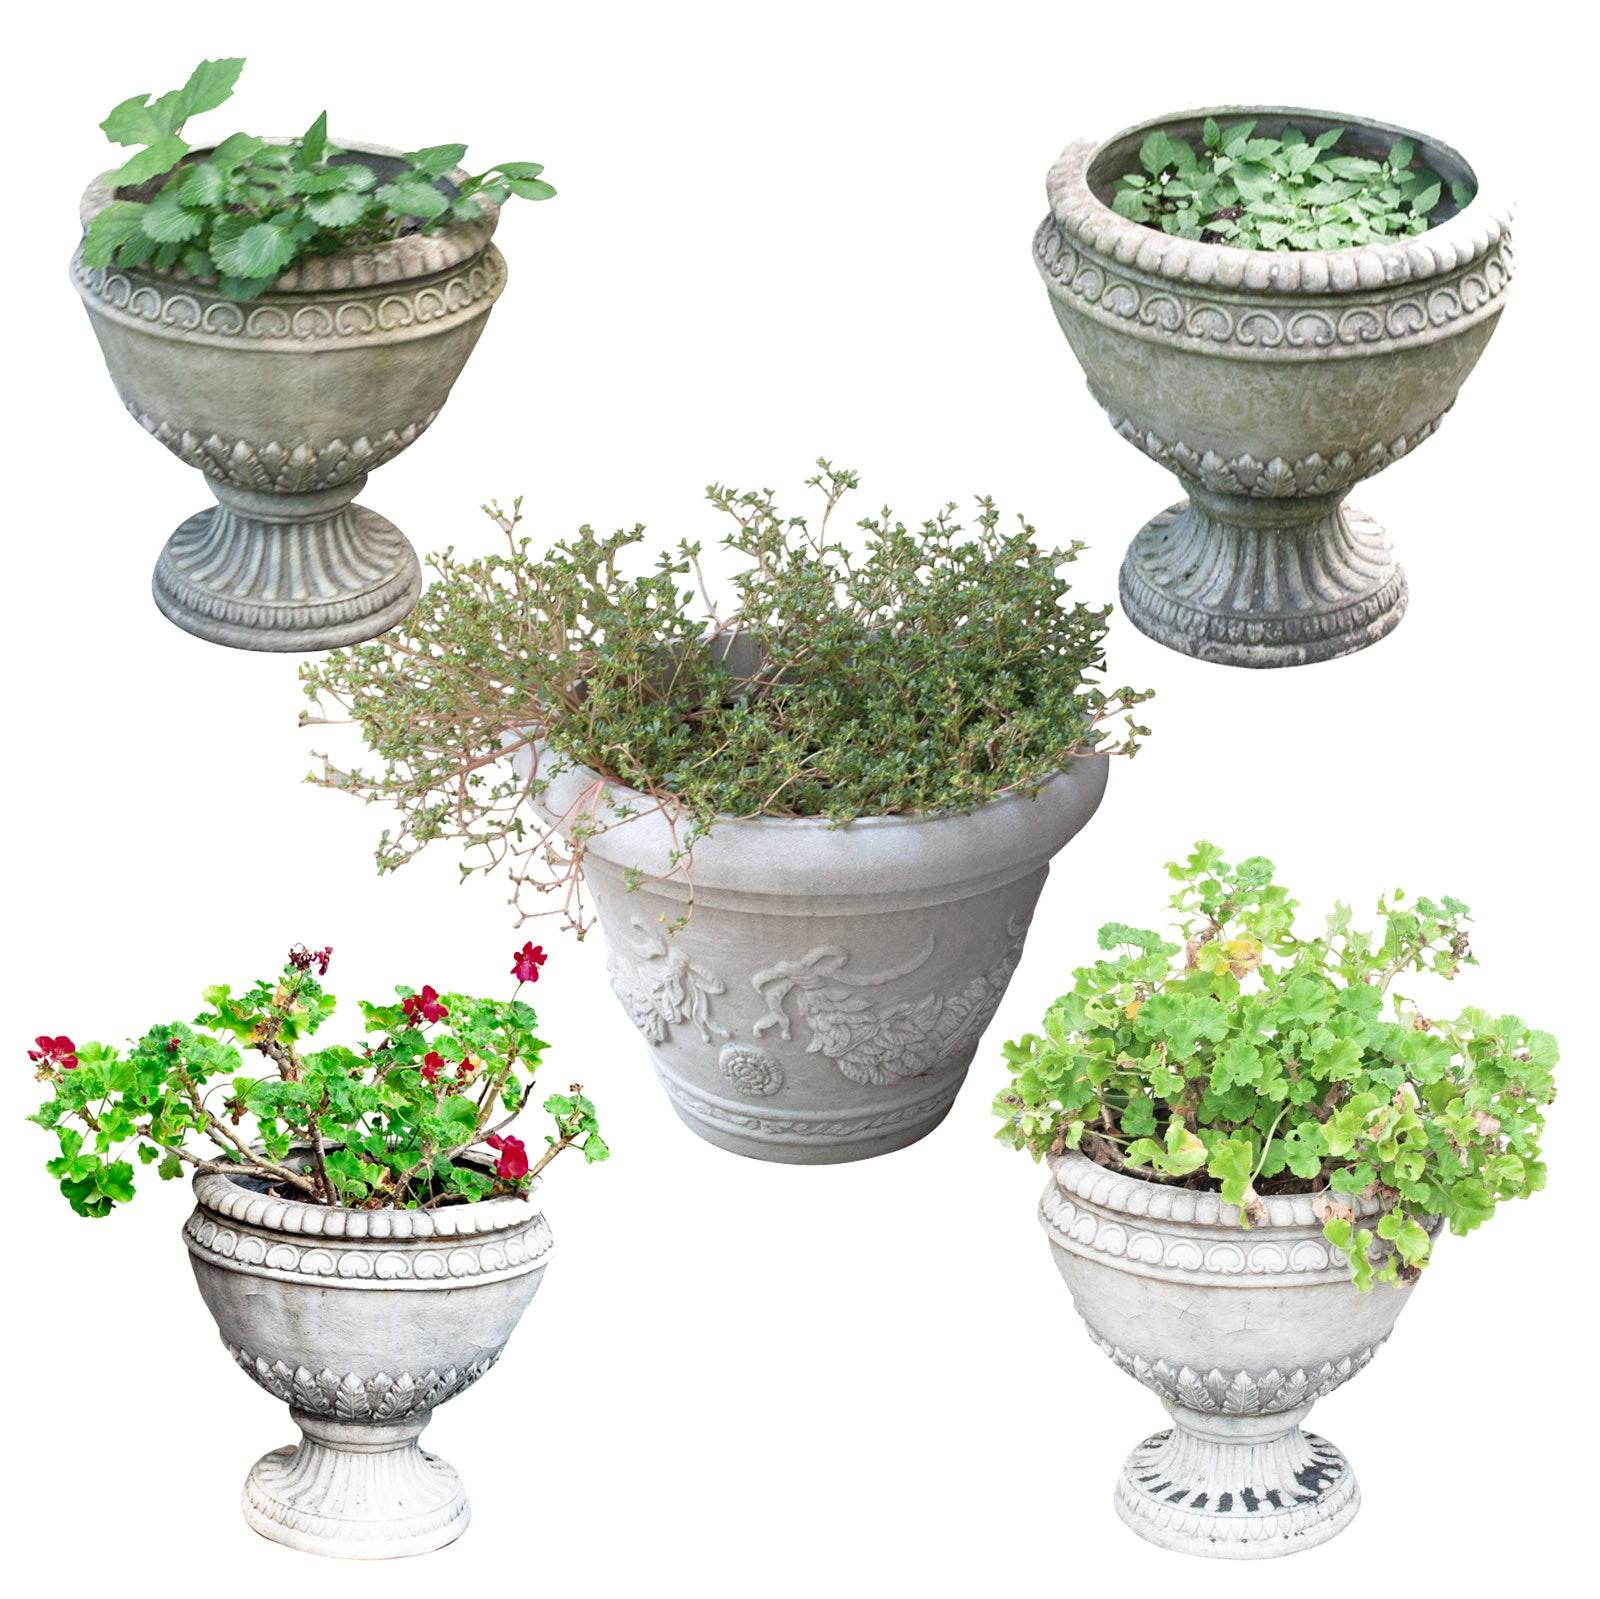 Five Outdoor Planters